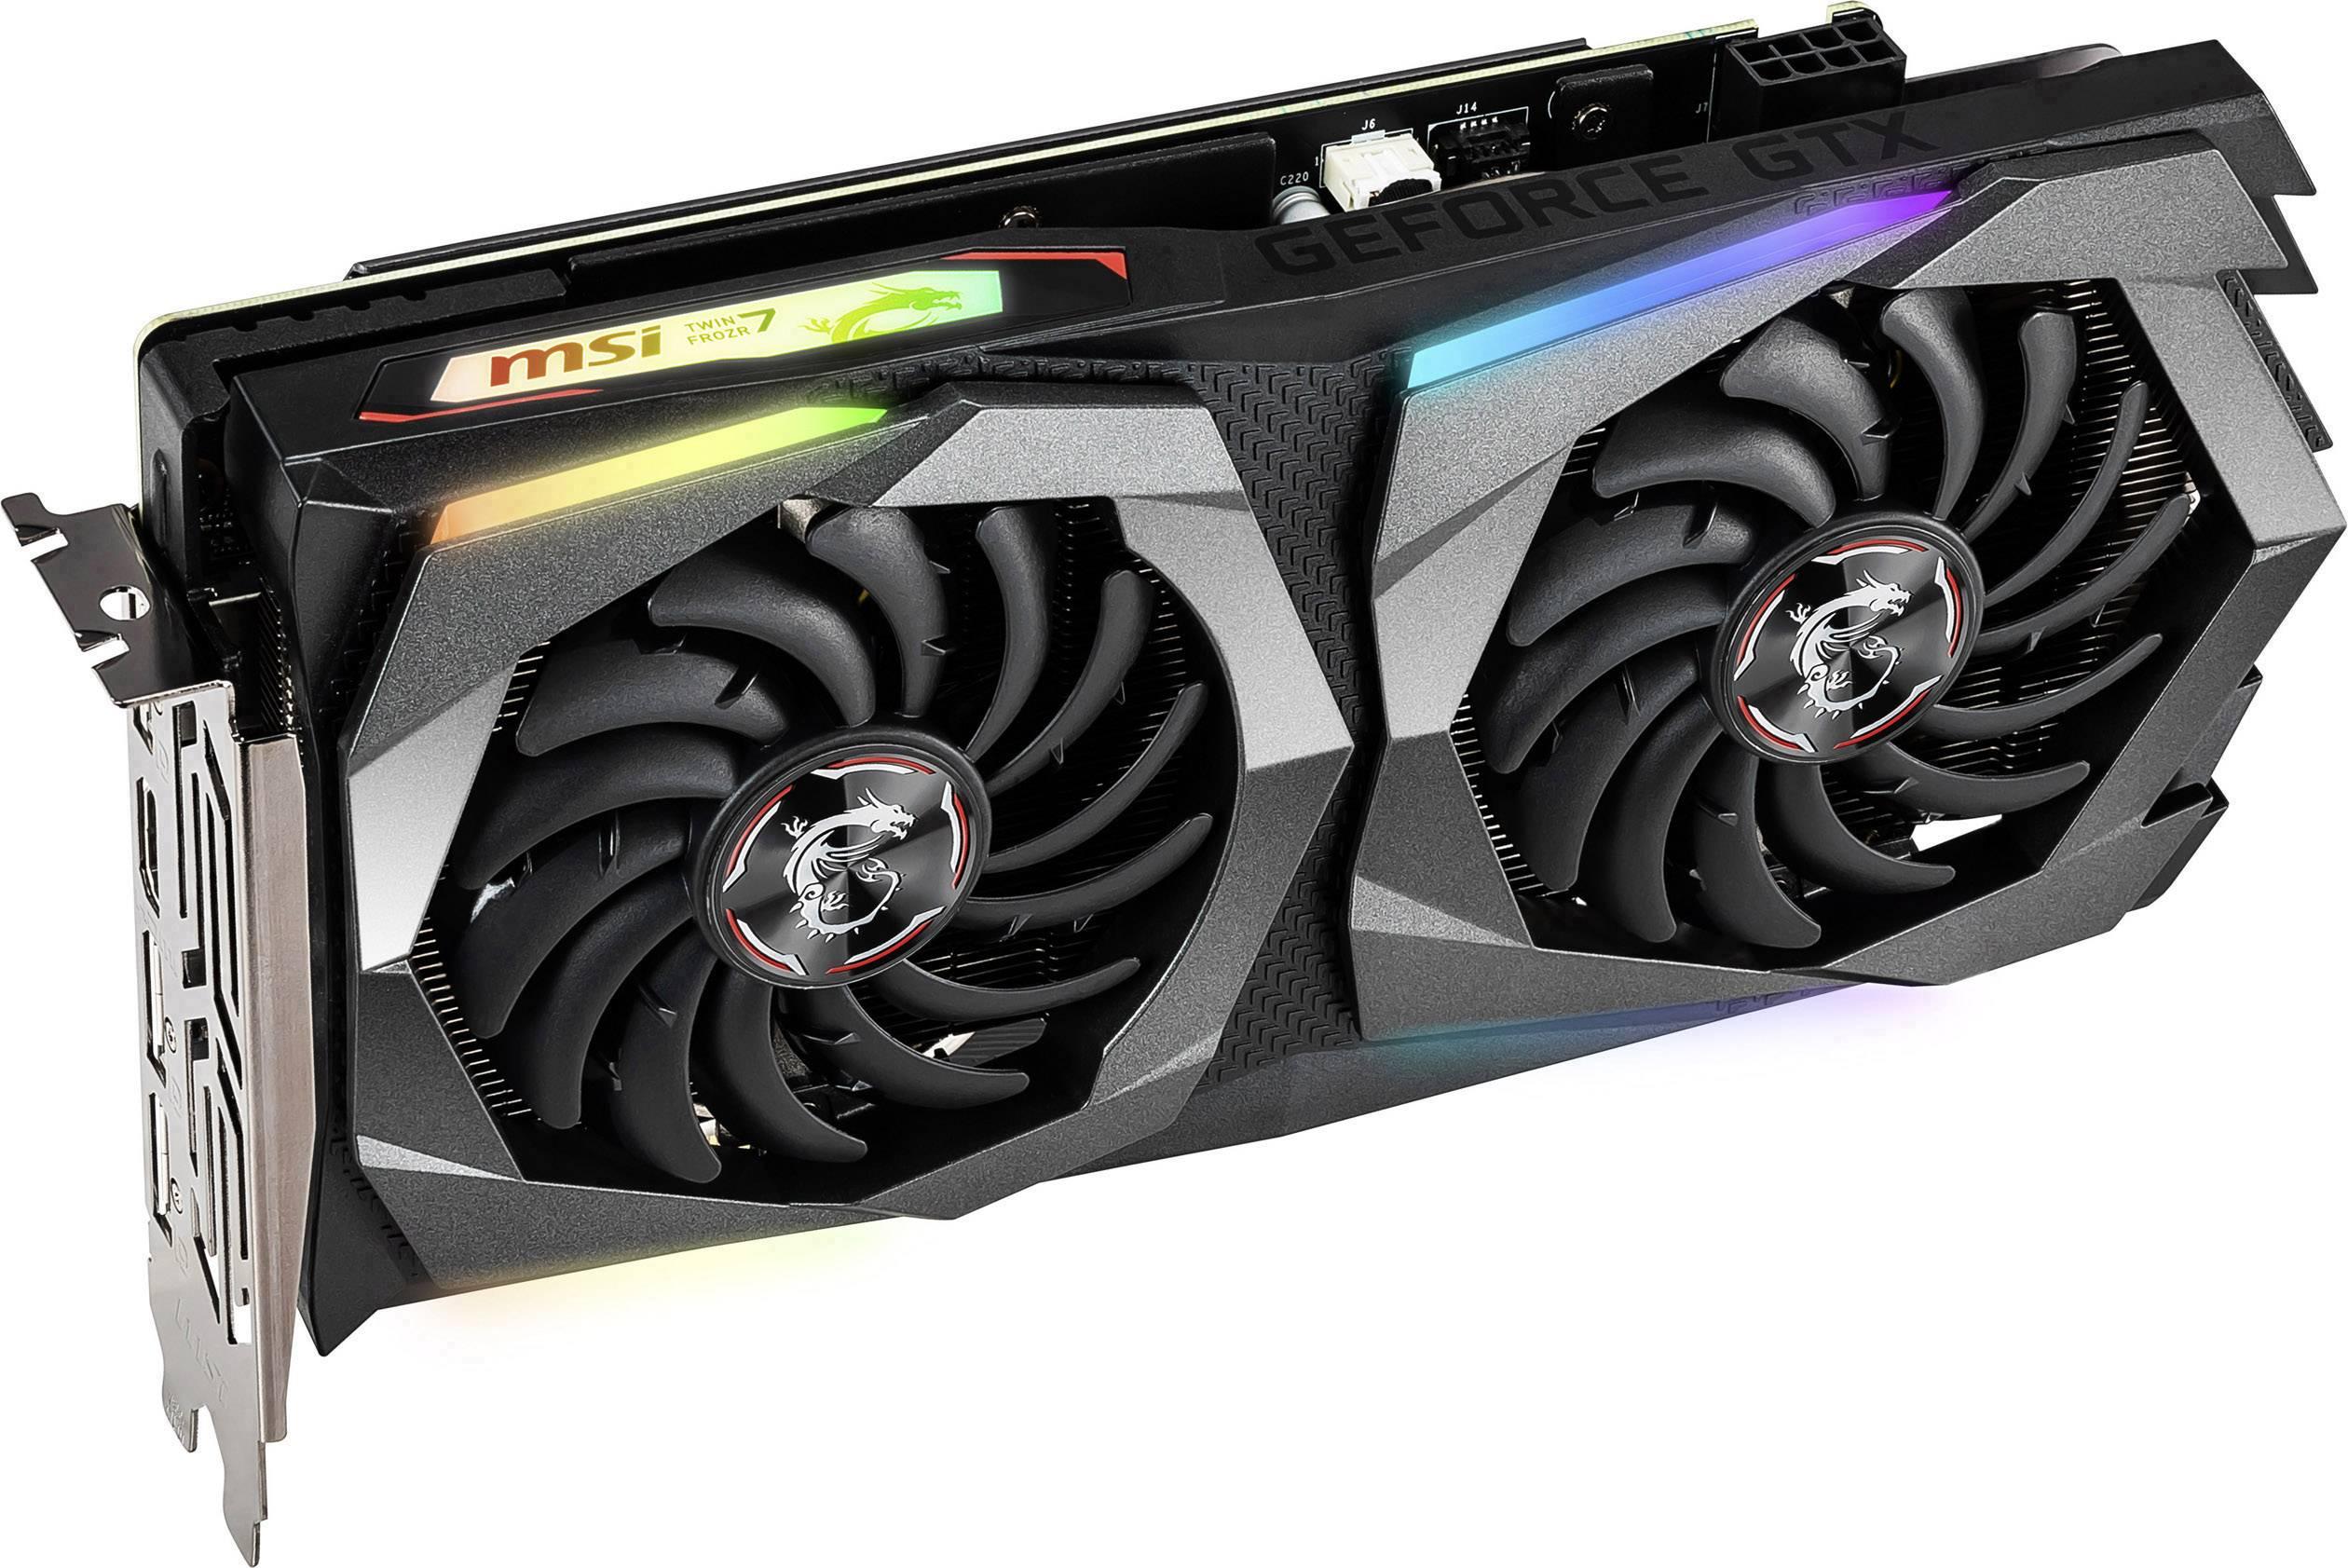 MSI Gaming GPU Nvidia GeForce GTX1660 Ti Gaming X 6 GB GDDR6 RAM PCIe x16  HDMI™, DisplayPort